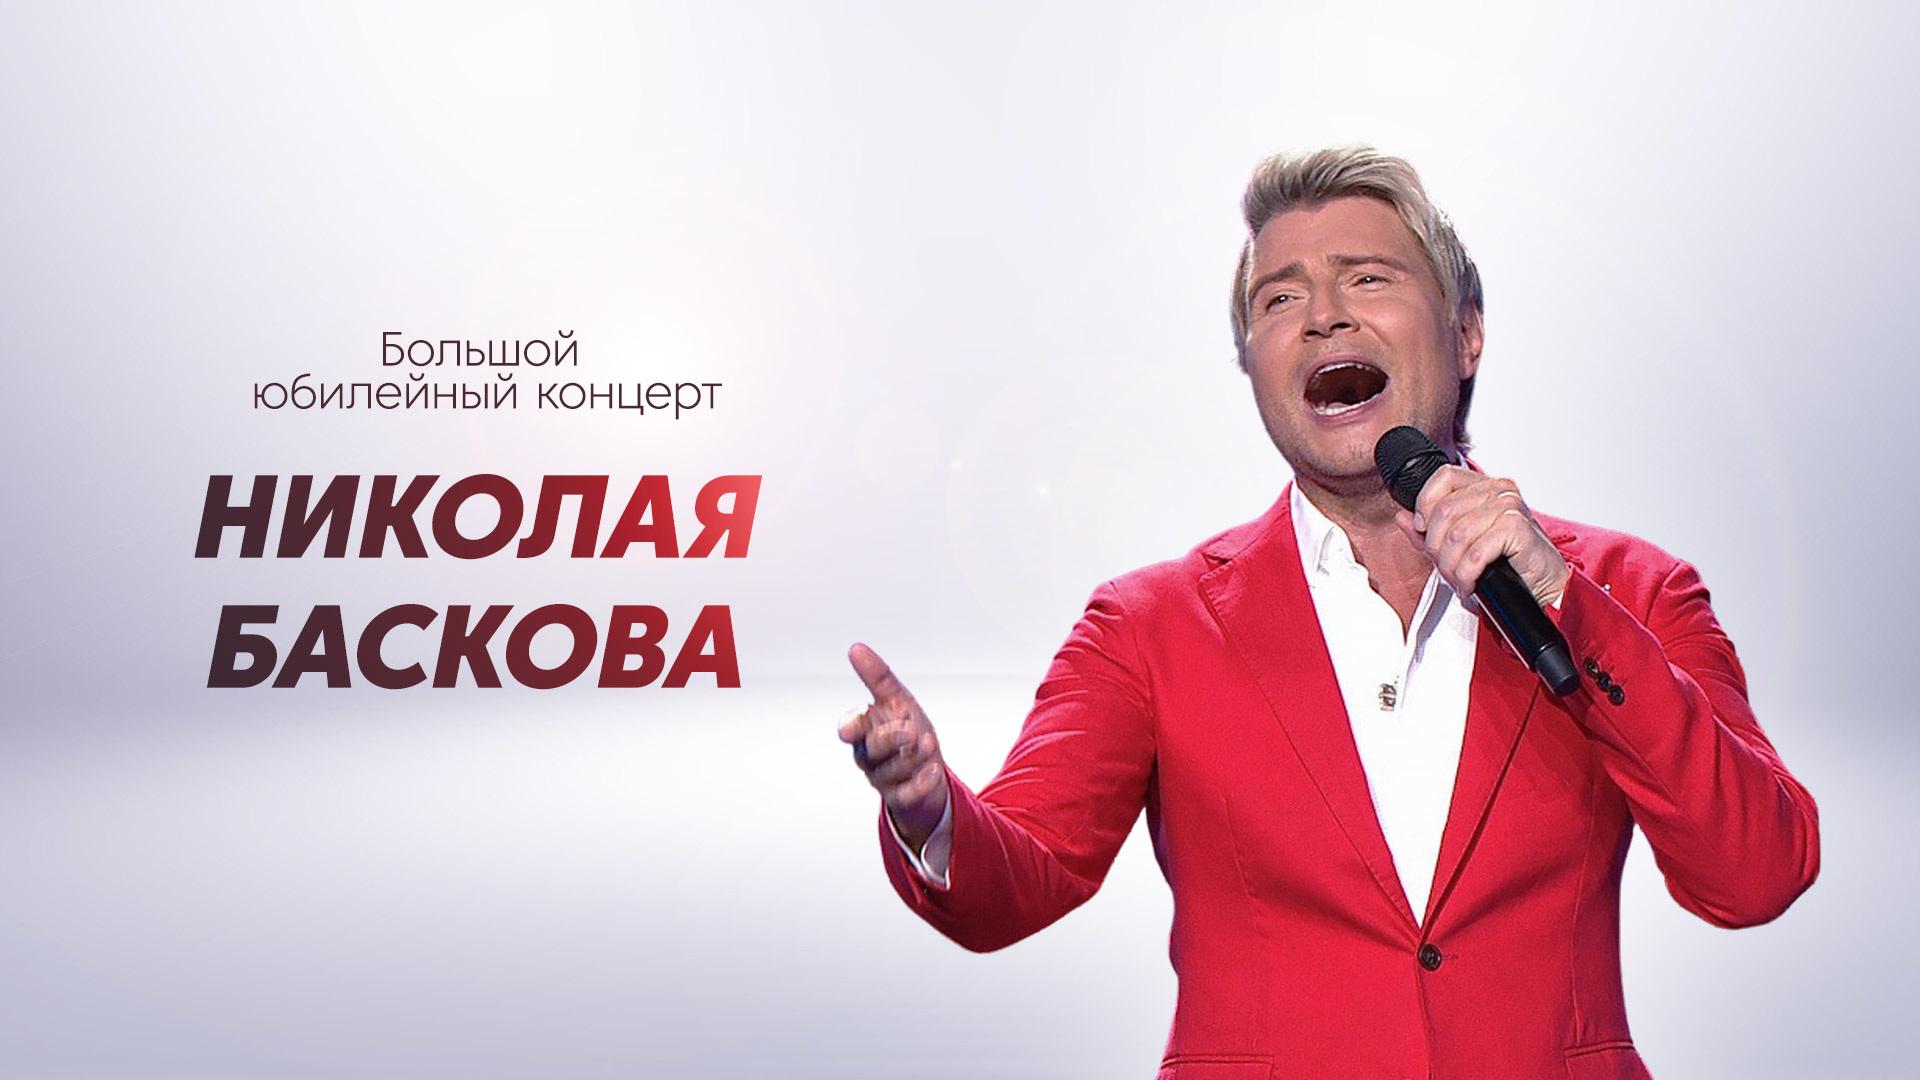 Большой юбилейный концерт Николая Баскова